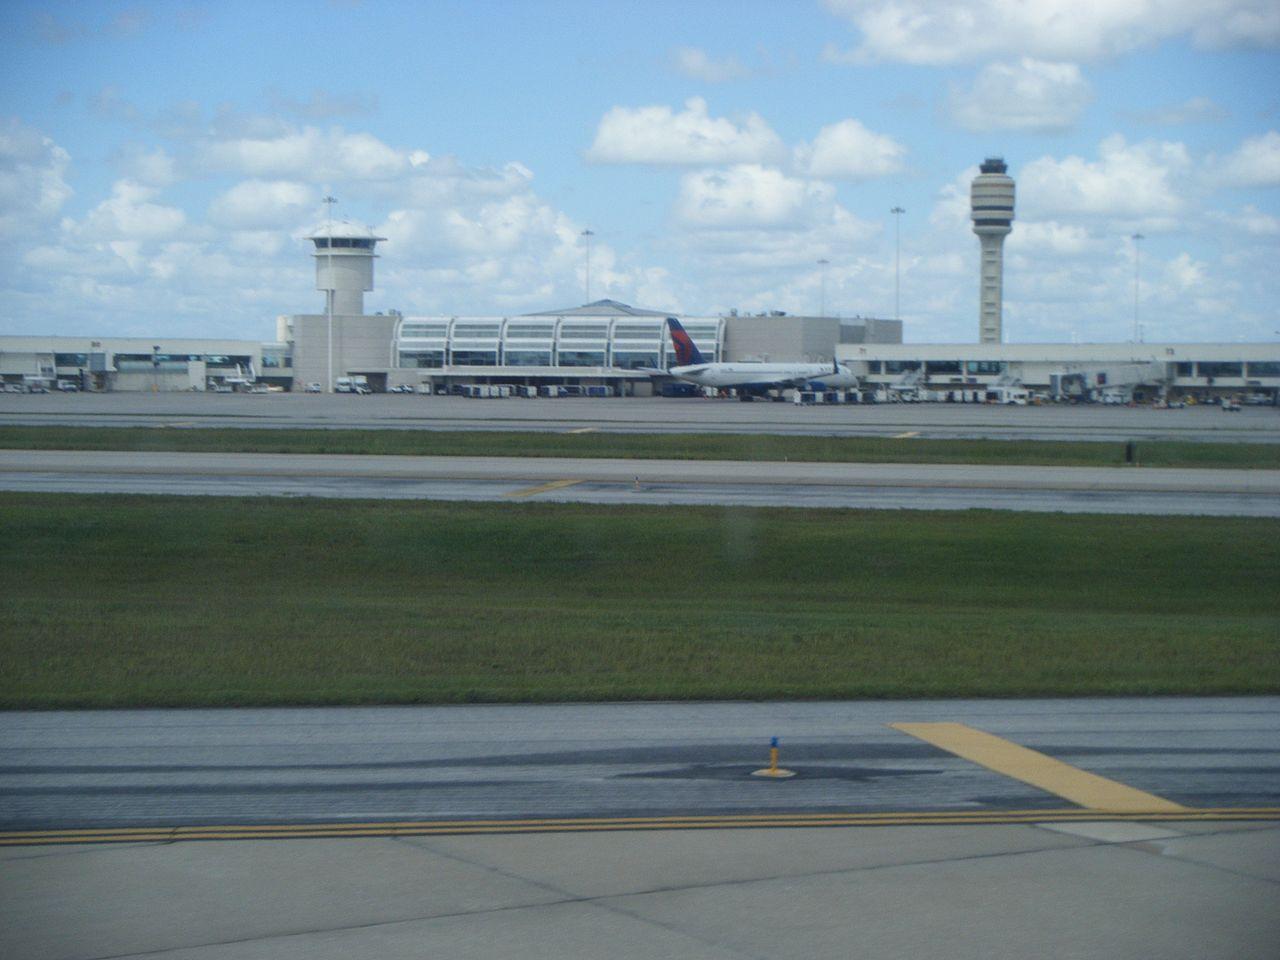 4. Orlando International Airport, Orlando - 53.83 sq km